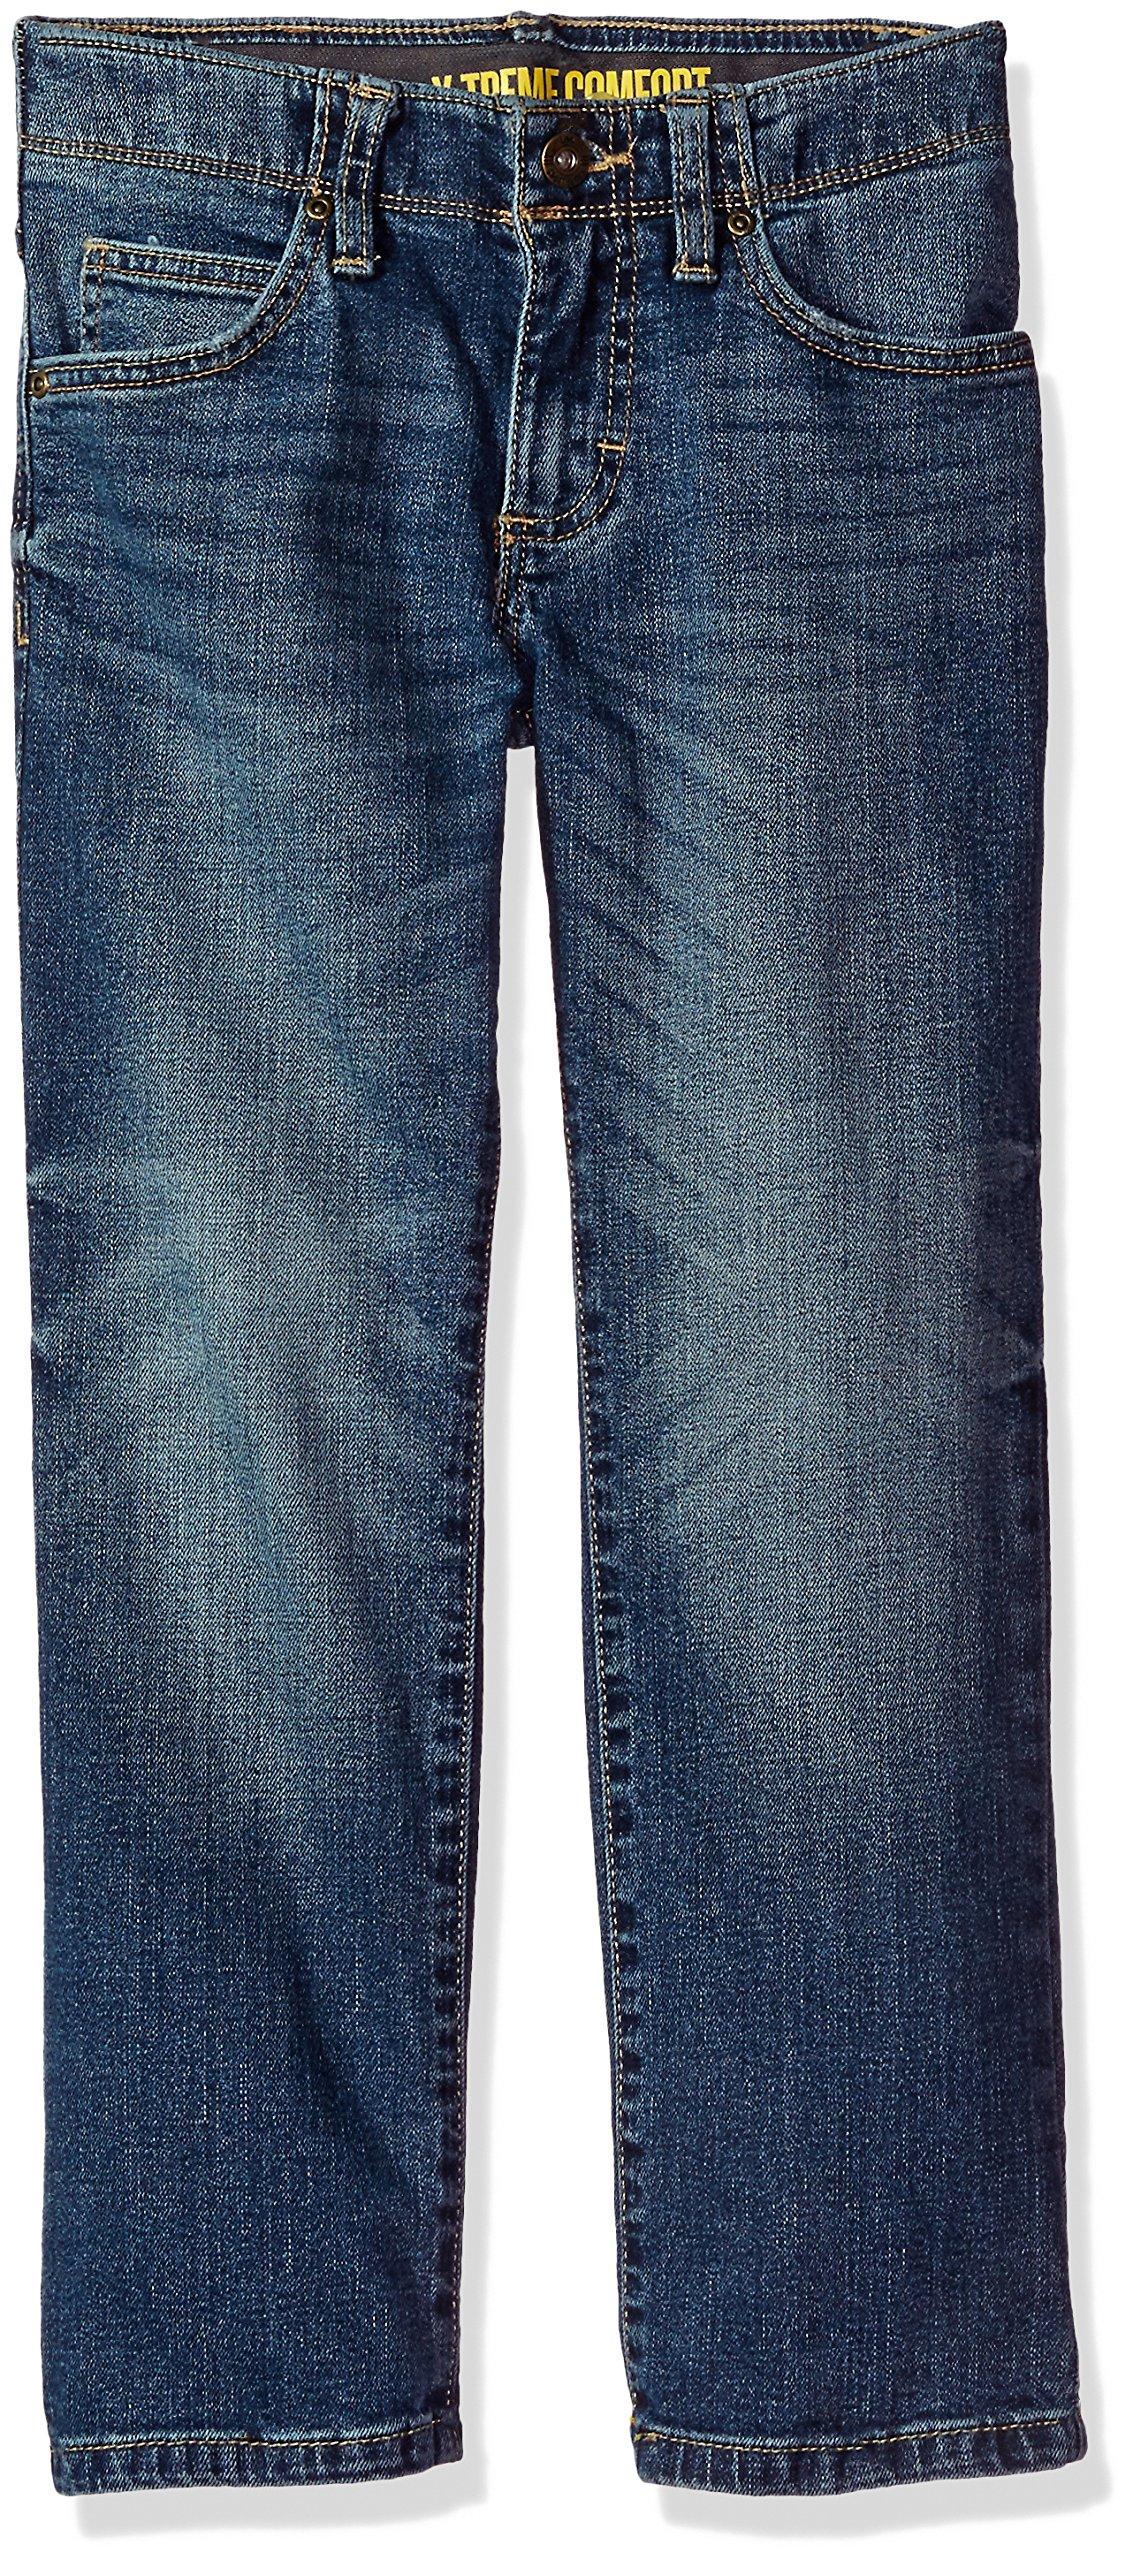 LEE Boys' Big Sport X-Treme Comfort Slim Jean, Osmond, 12 Regular